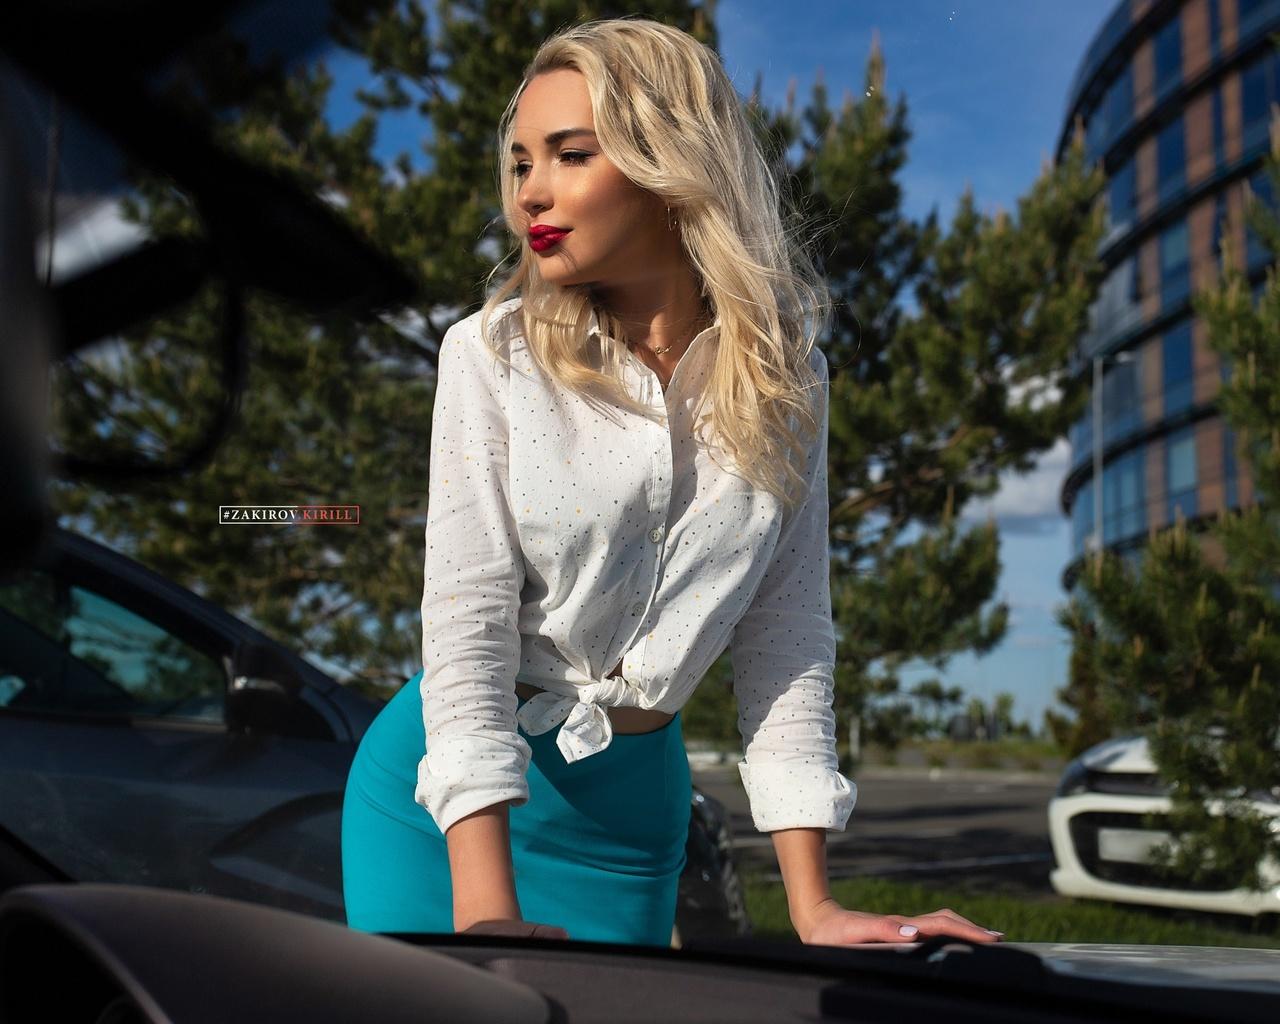 women, blonde, blue skirt, white shirt, women outdoors, kirill zakirov, red lipstick, car, trees, women with cars, pink nails, building, brunette